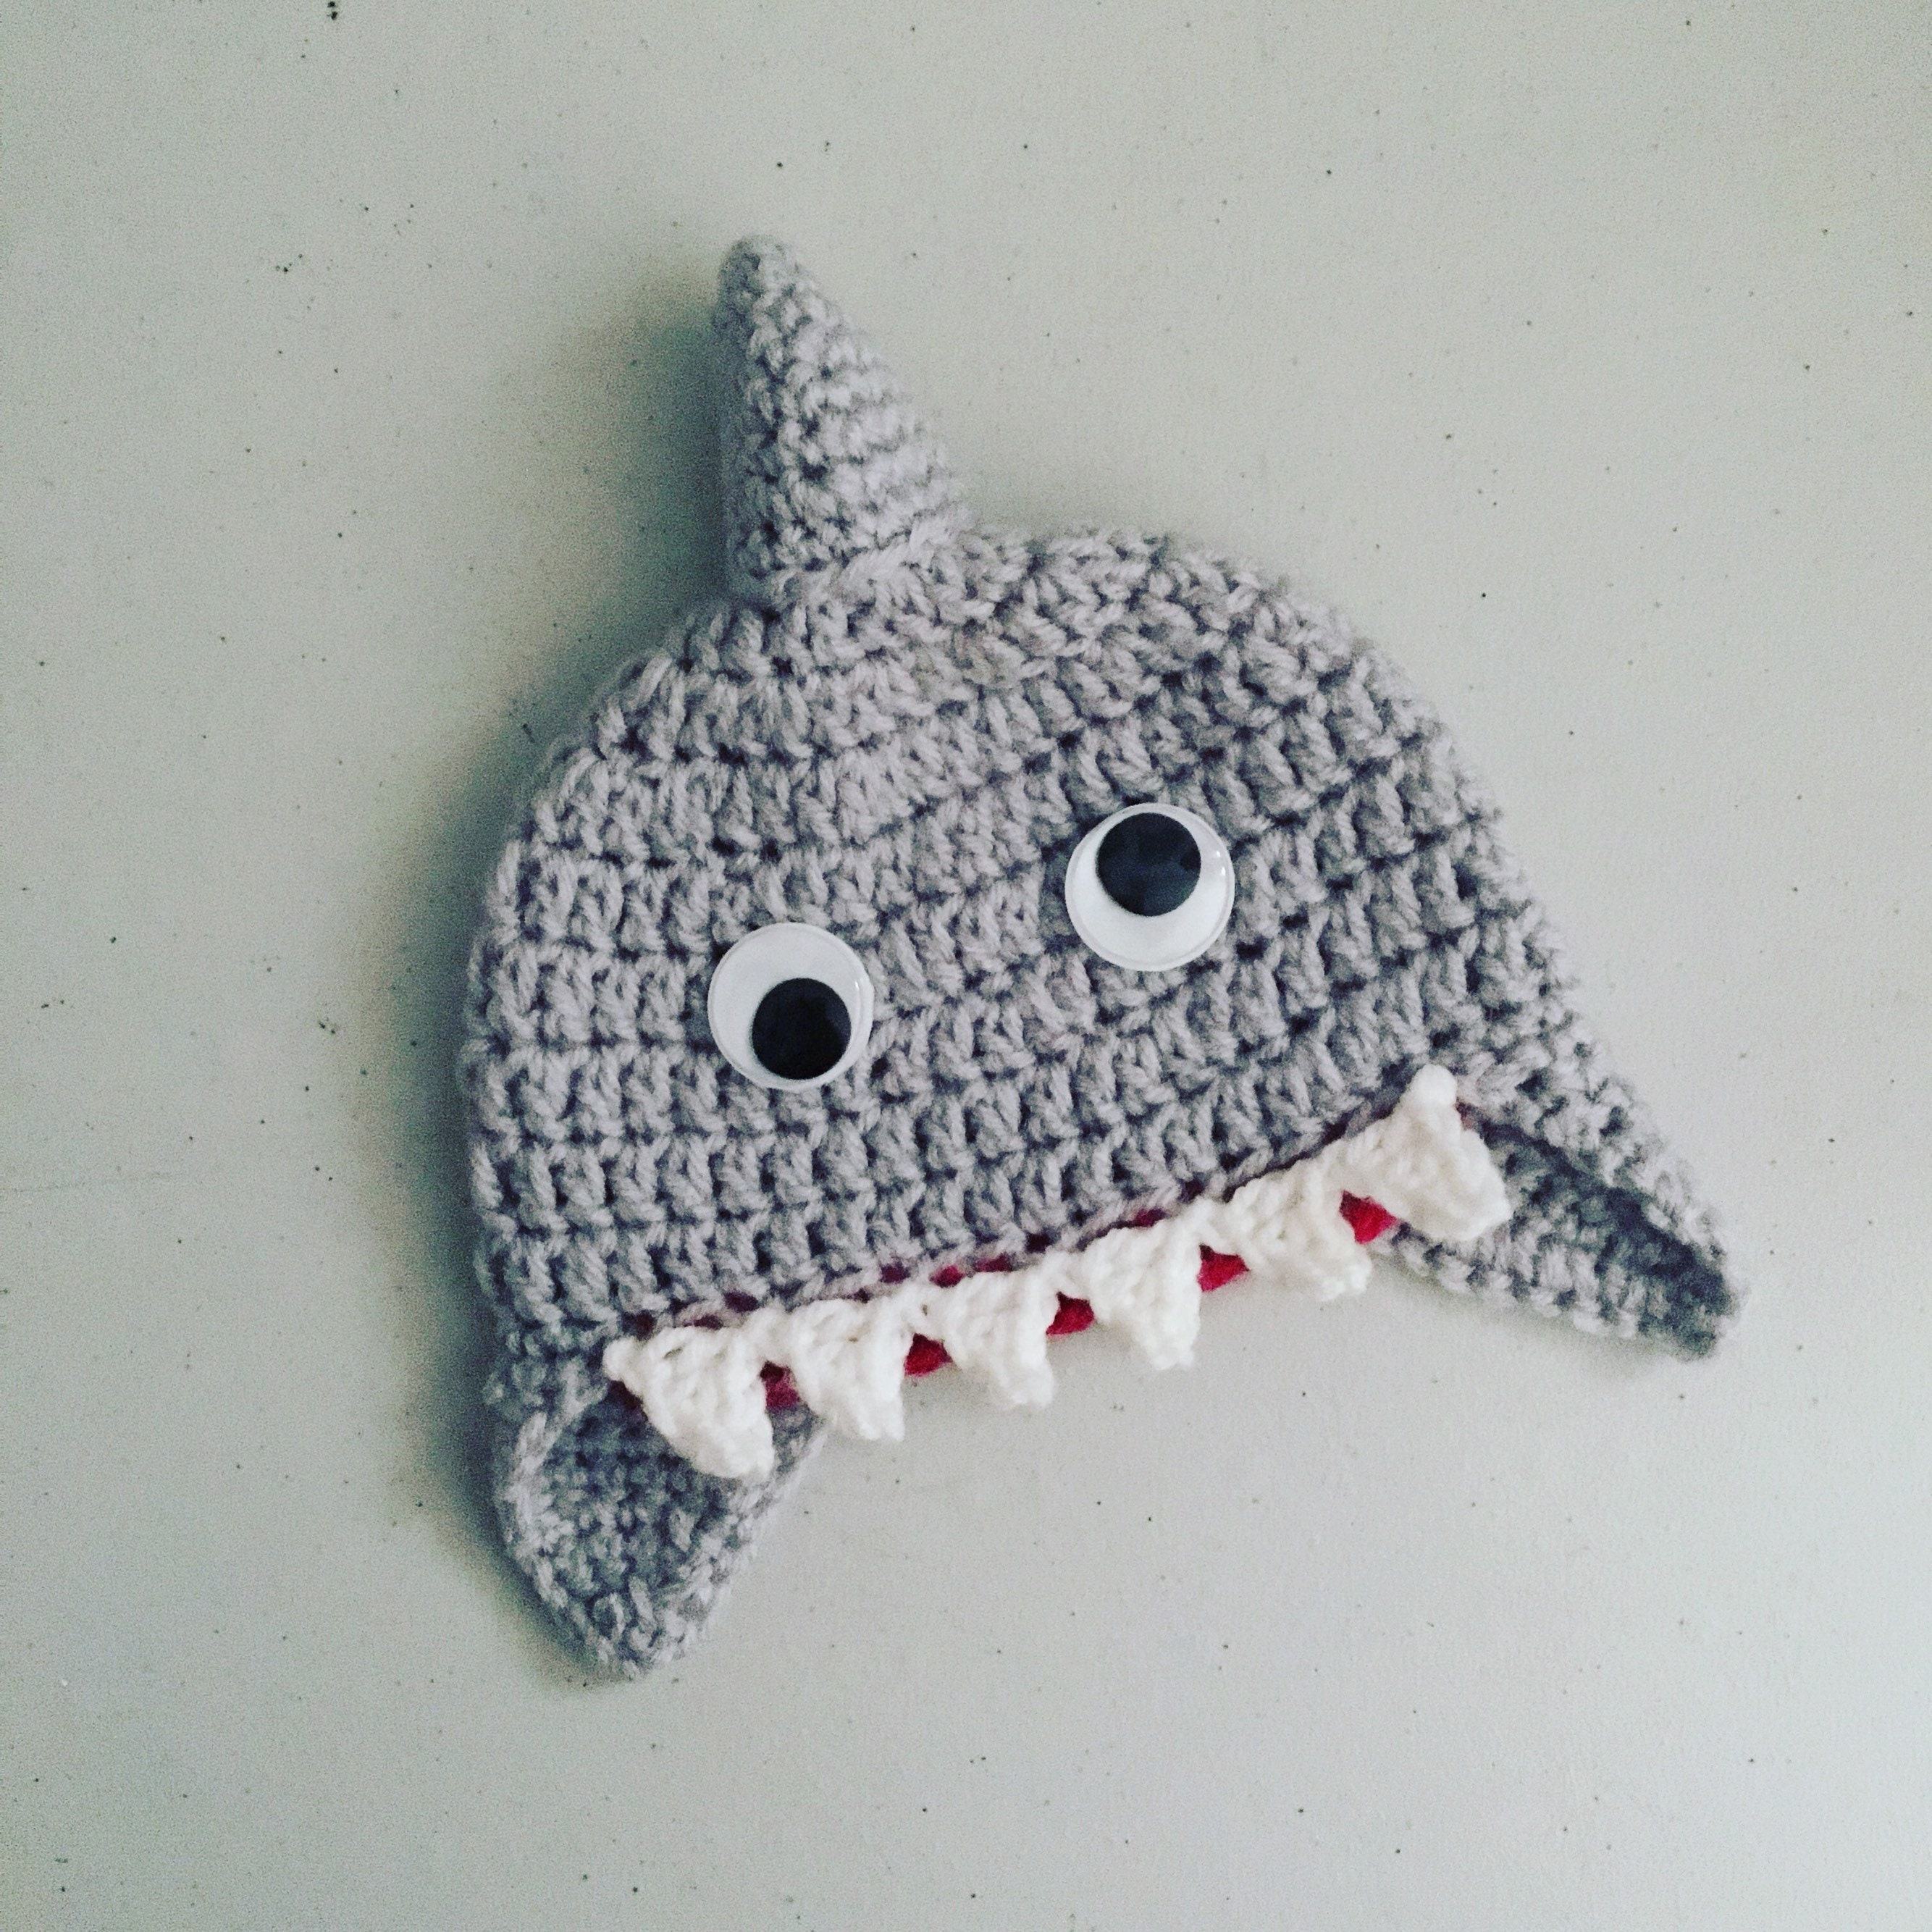 Crochet Shark Hat Crochet Shark Beanie Shark Hat Shark  e34e527997bc